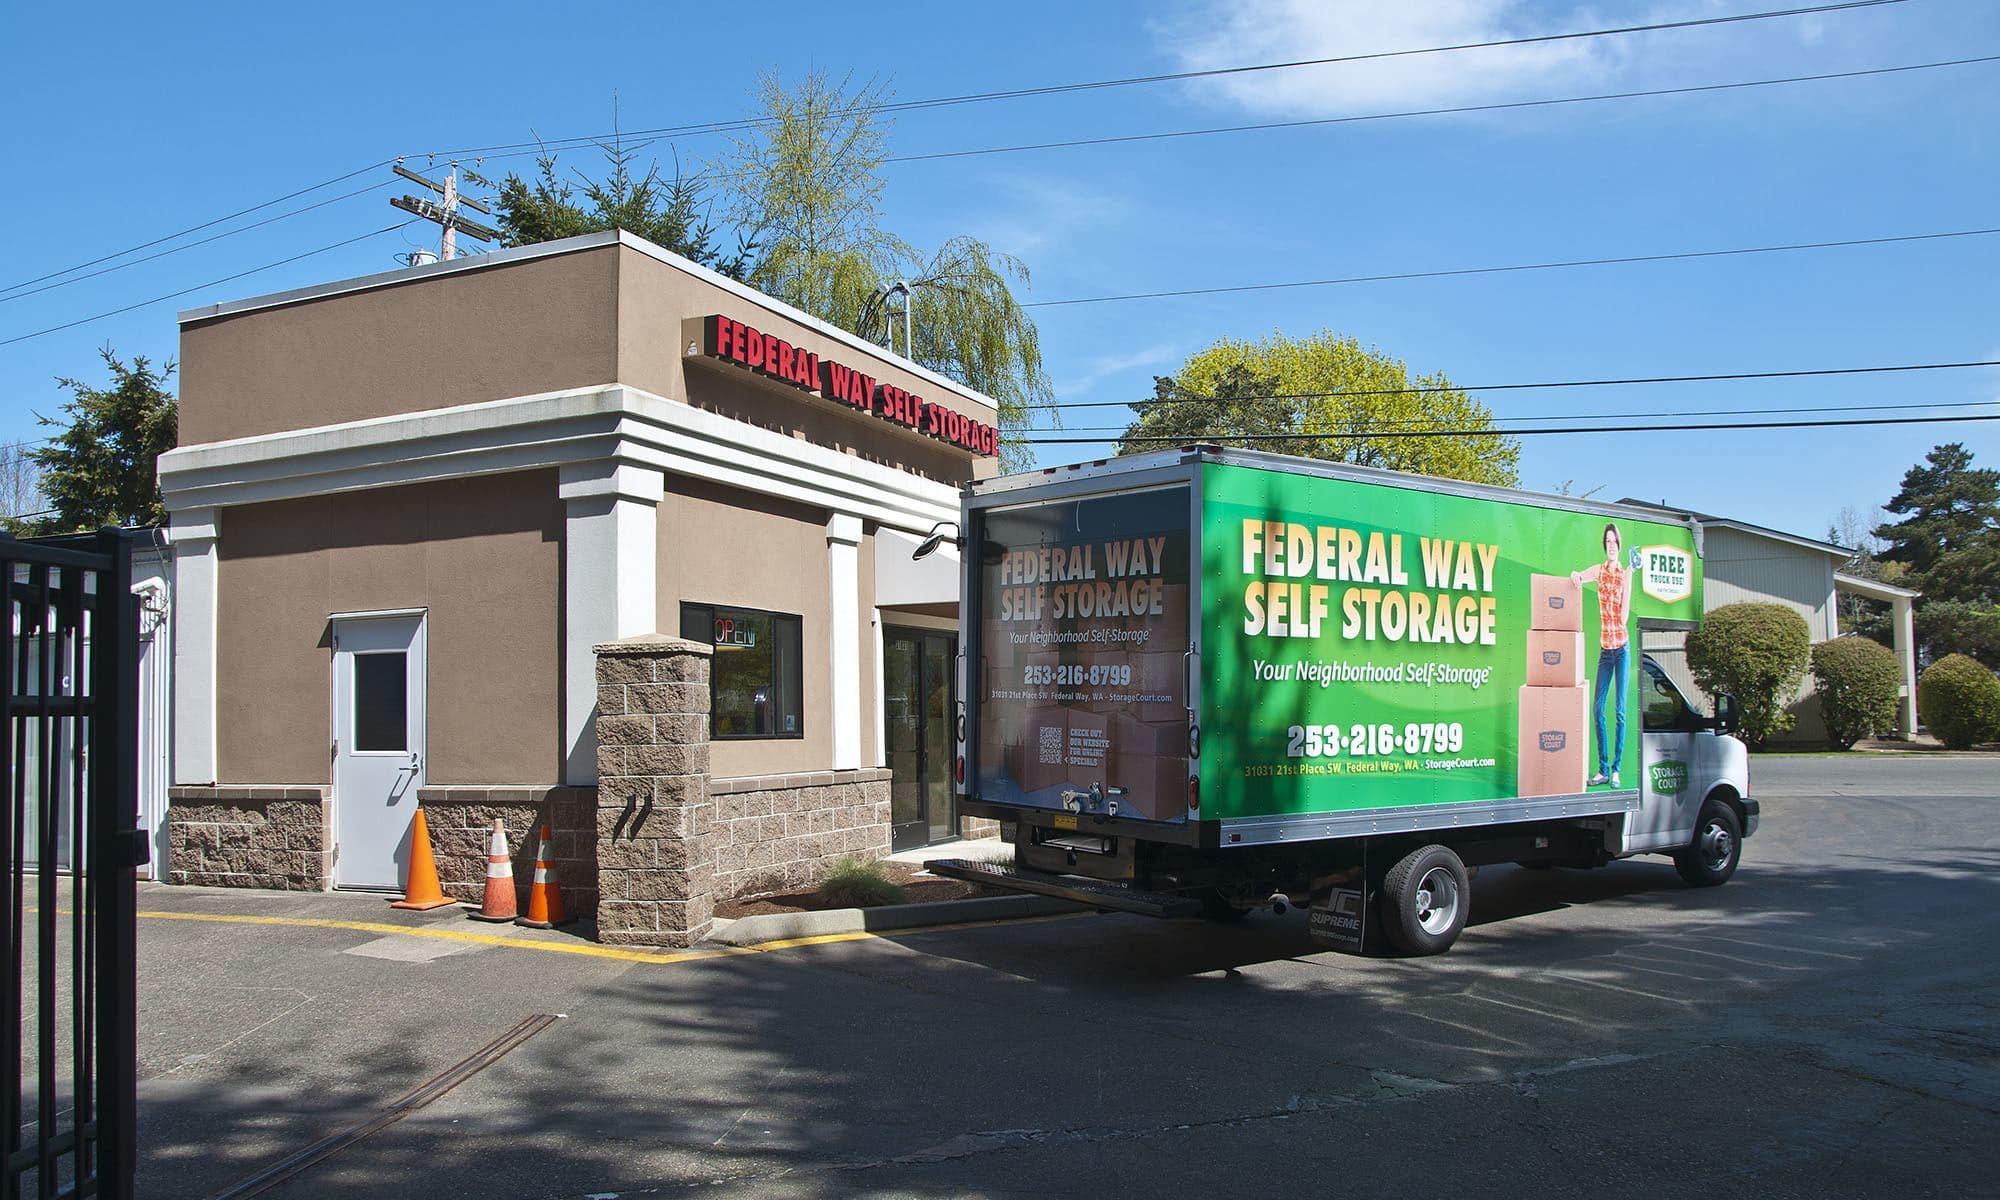 Self Storage In Federal Way Wa